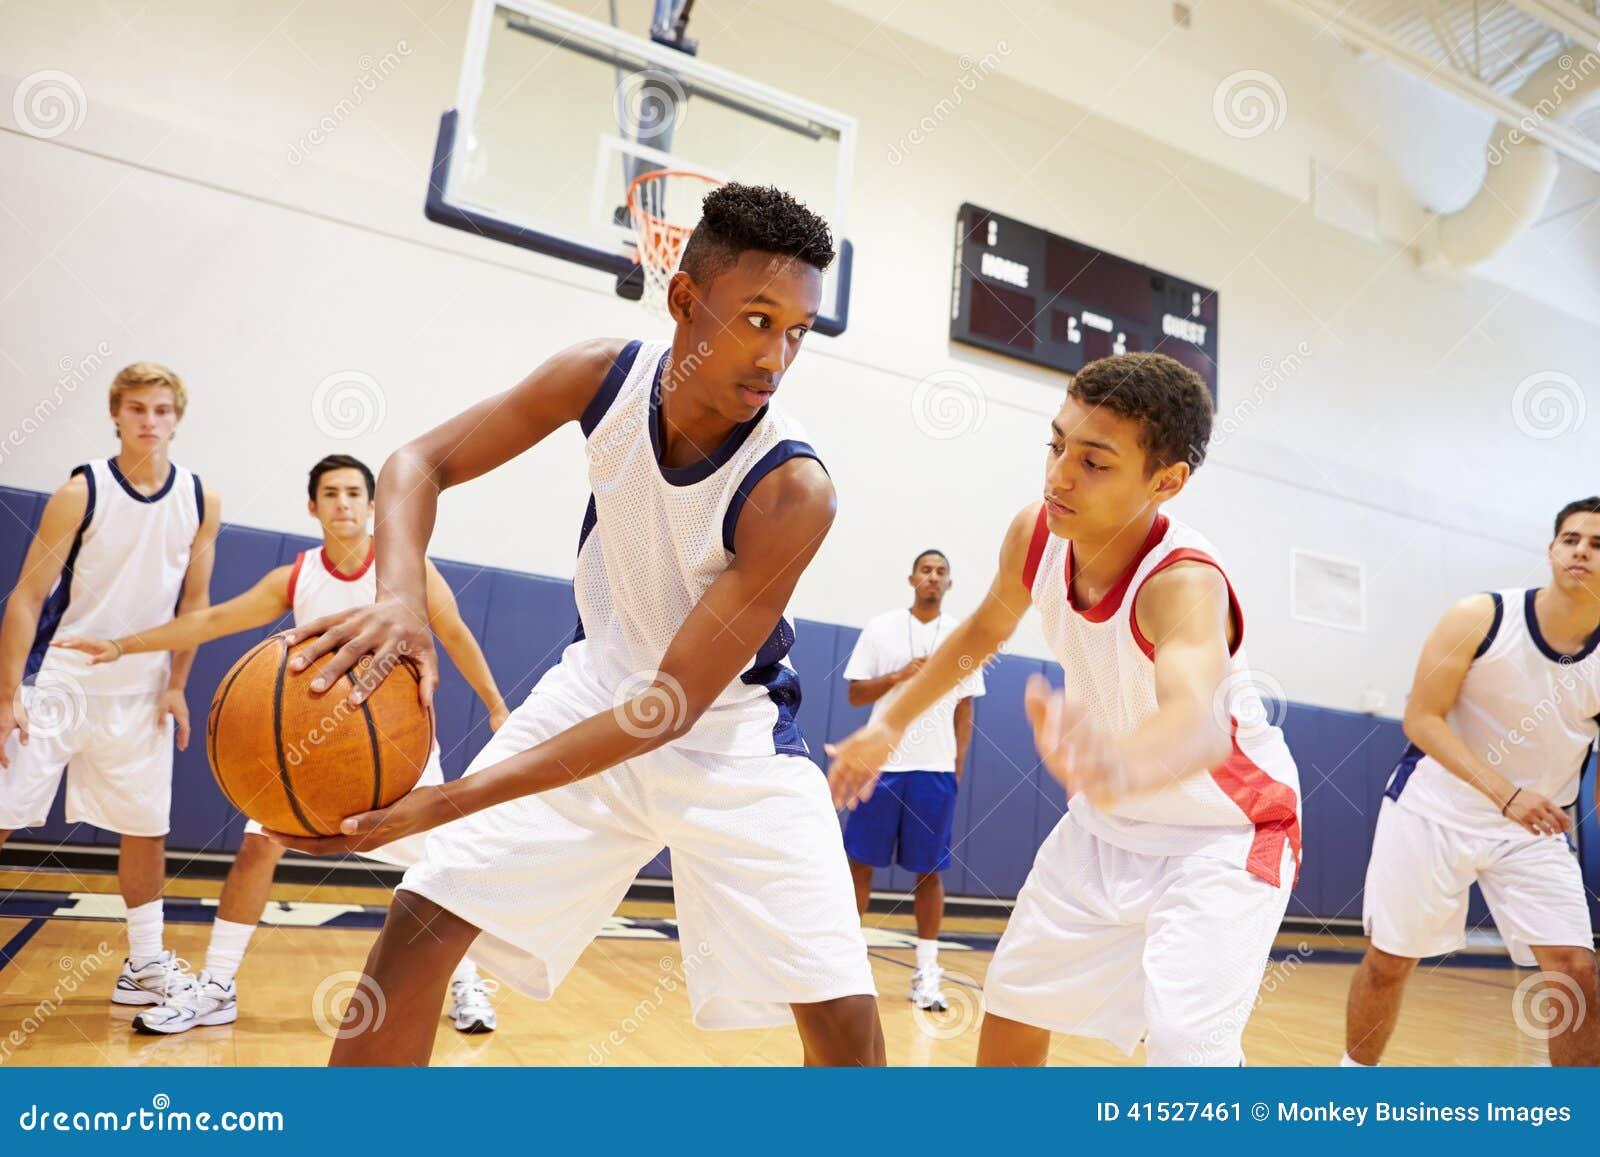 Baloncesto masculino Team Playing Game de la High School secundaria